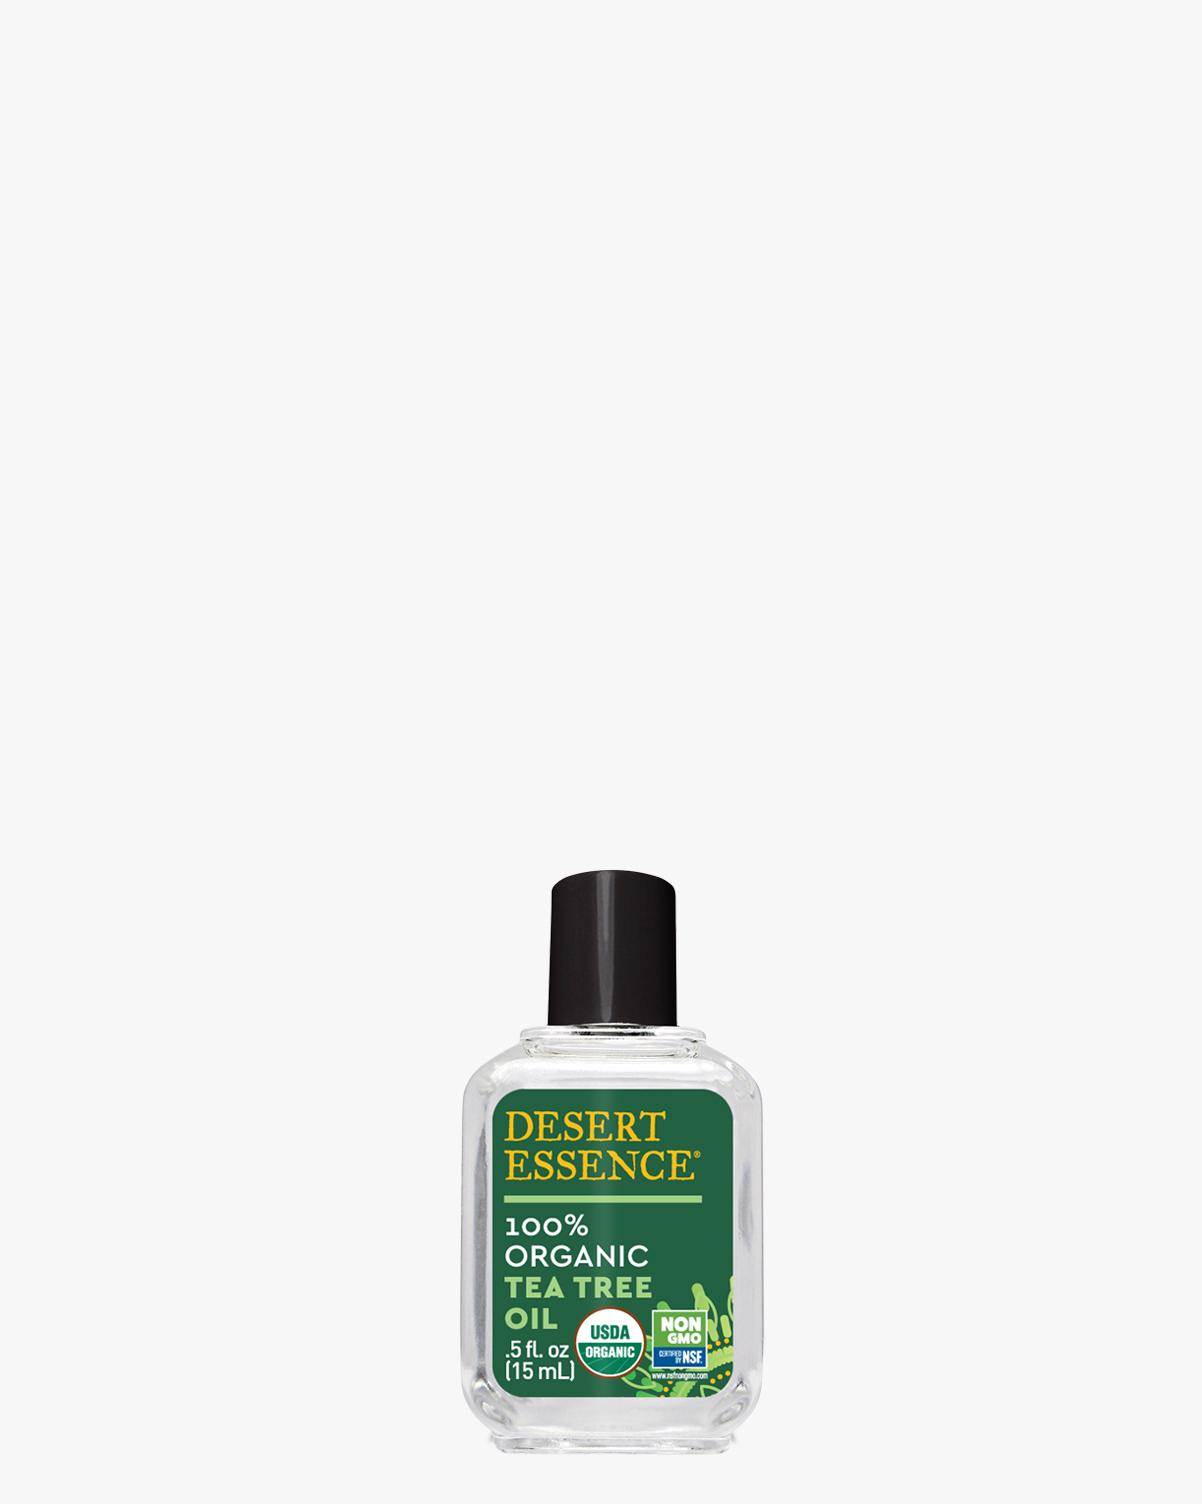 Desert Essence coupon: Desert Essence Organic Tea Tree Oil, 0.5 fl. oz. | Vegan | Gluten-Free